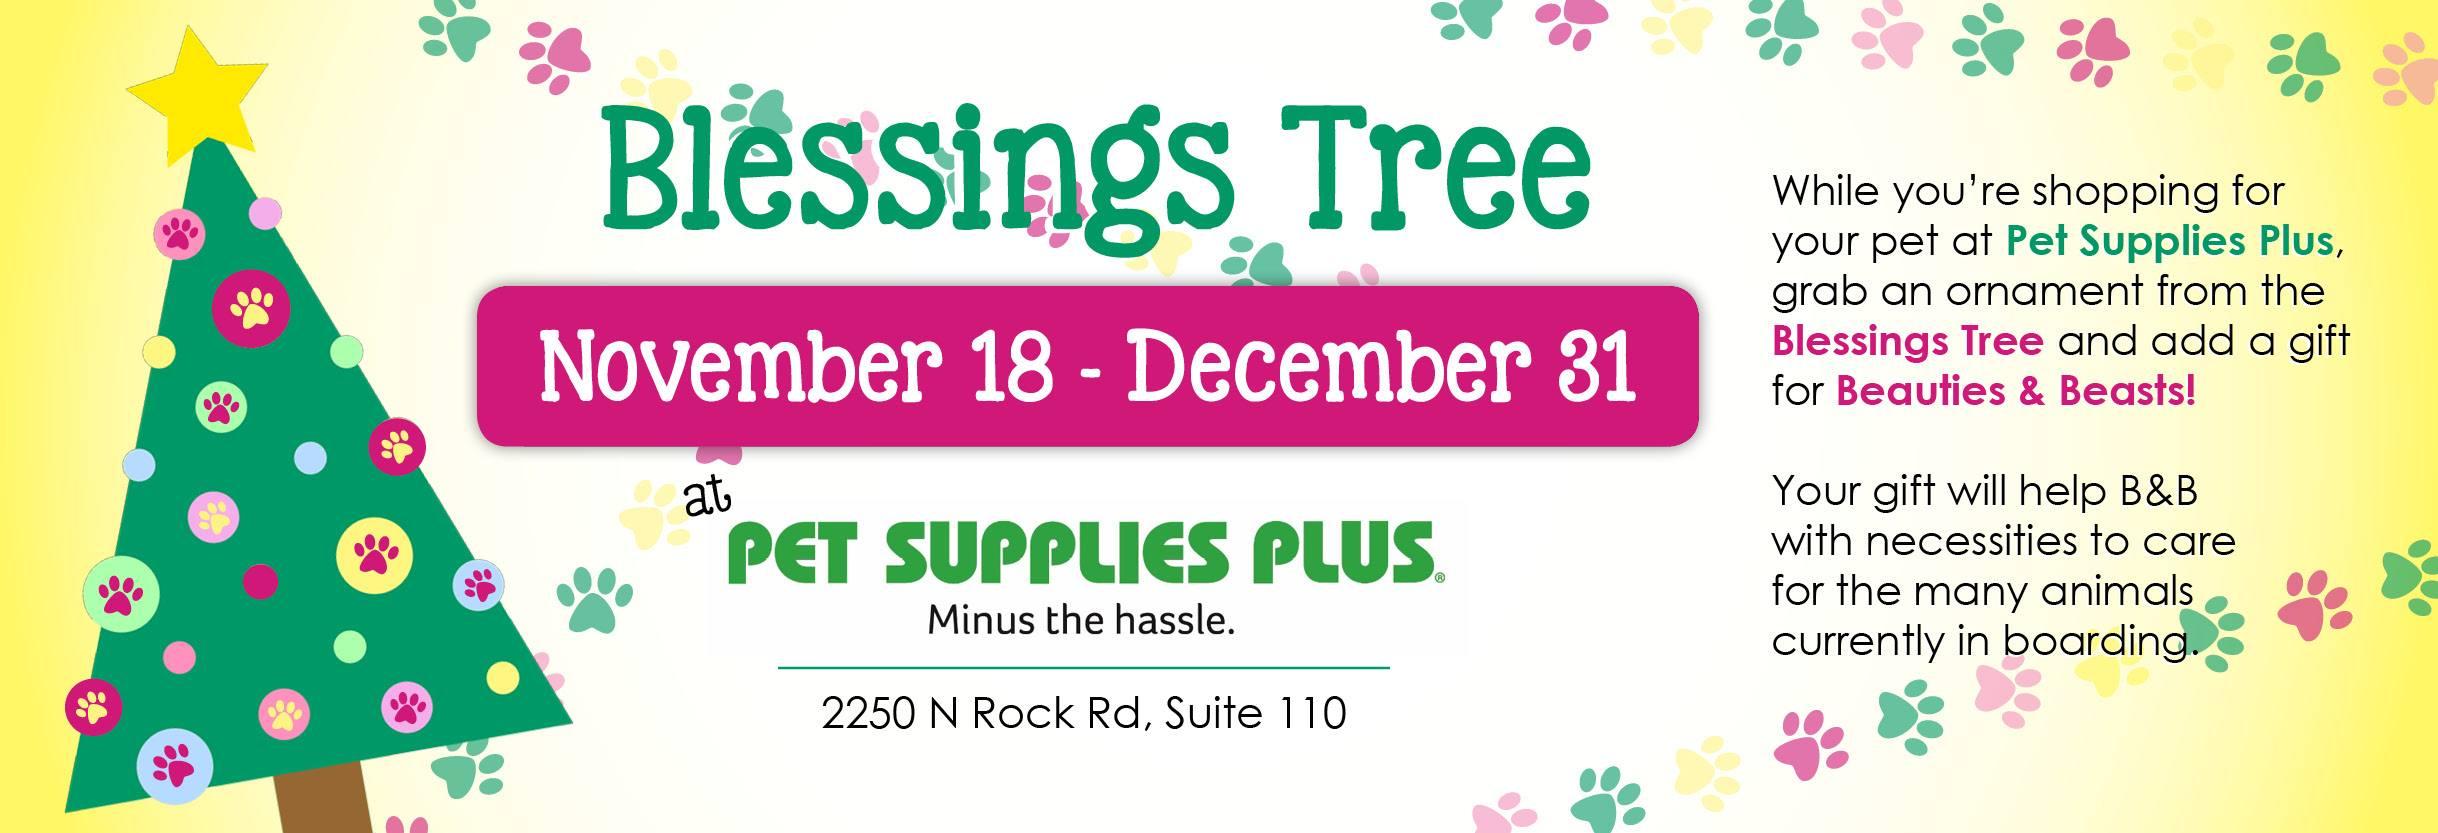 Blessings Tree